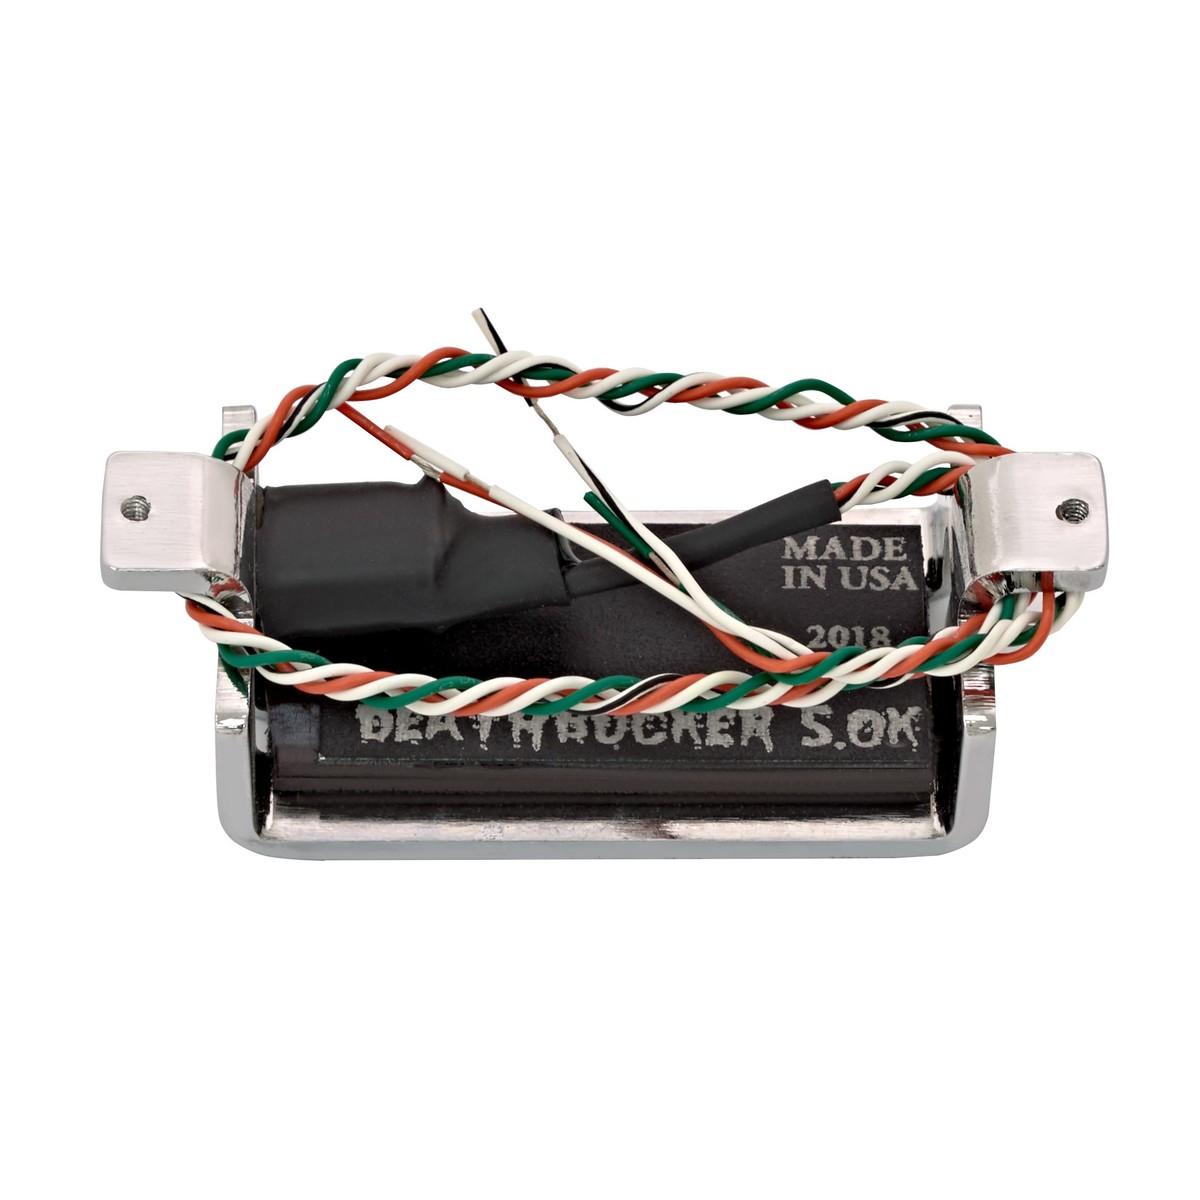 hight resolution of  lace sensor alumitone deathbucker chrome back